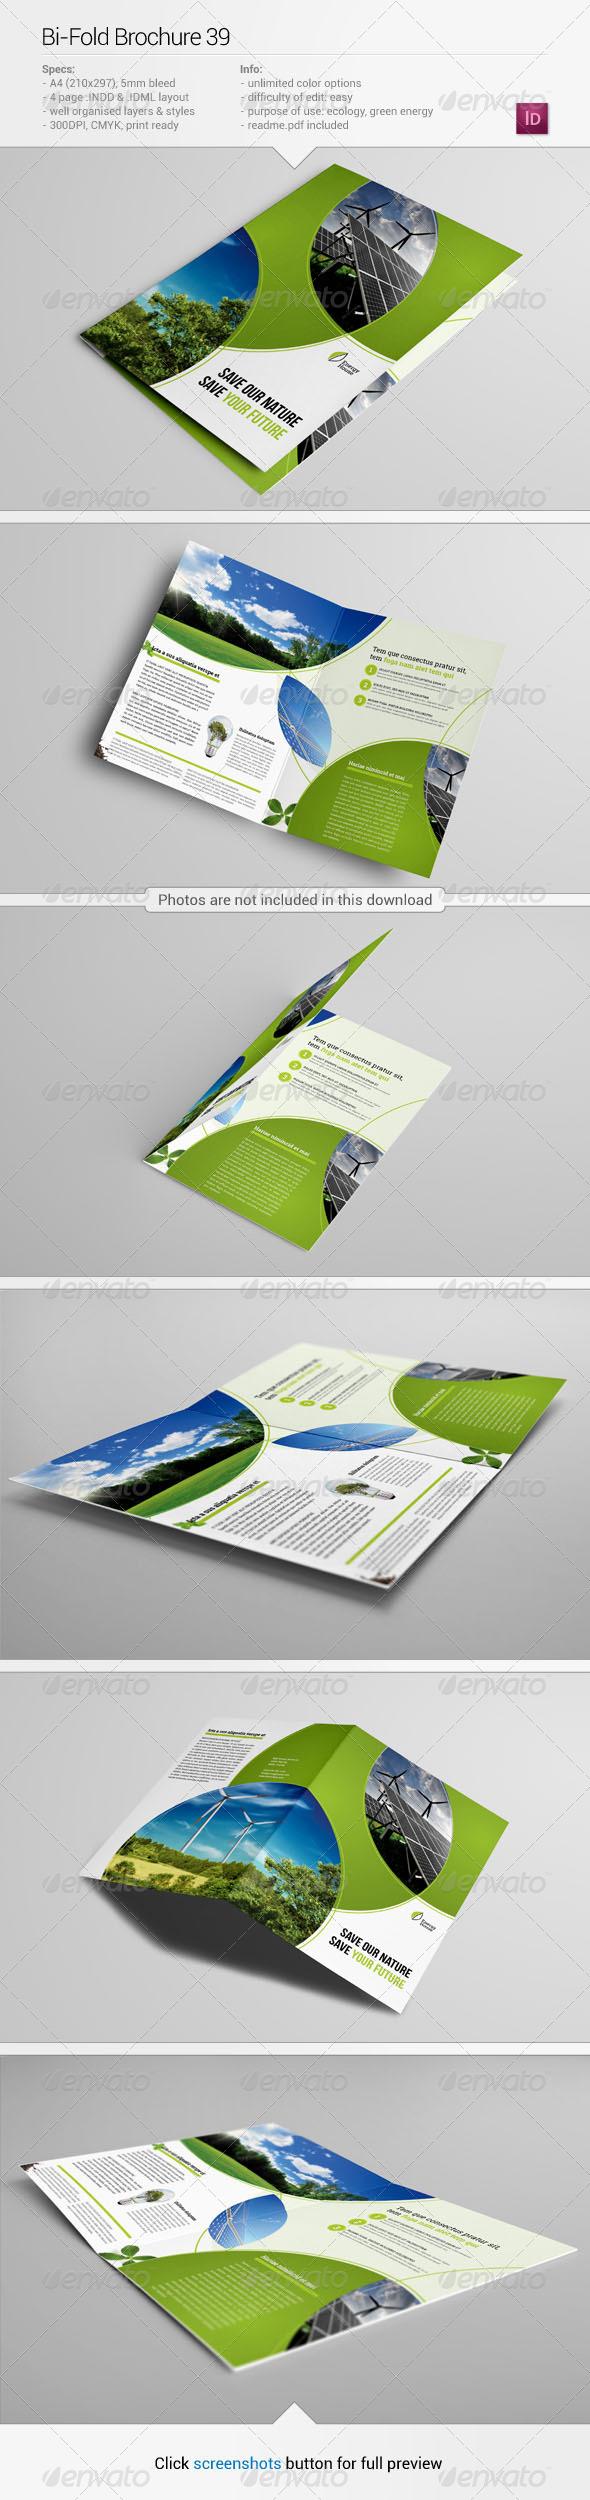 Bi fold brochure 39 informational brochures for Bi fold brochure template illustrator